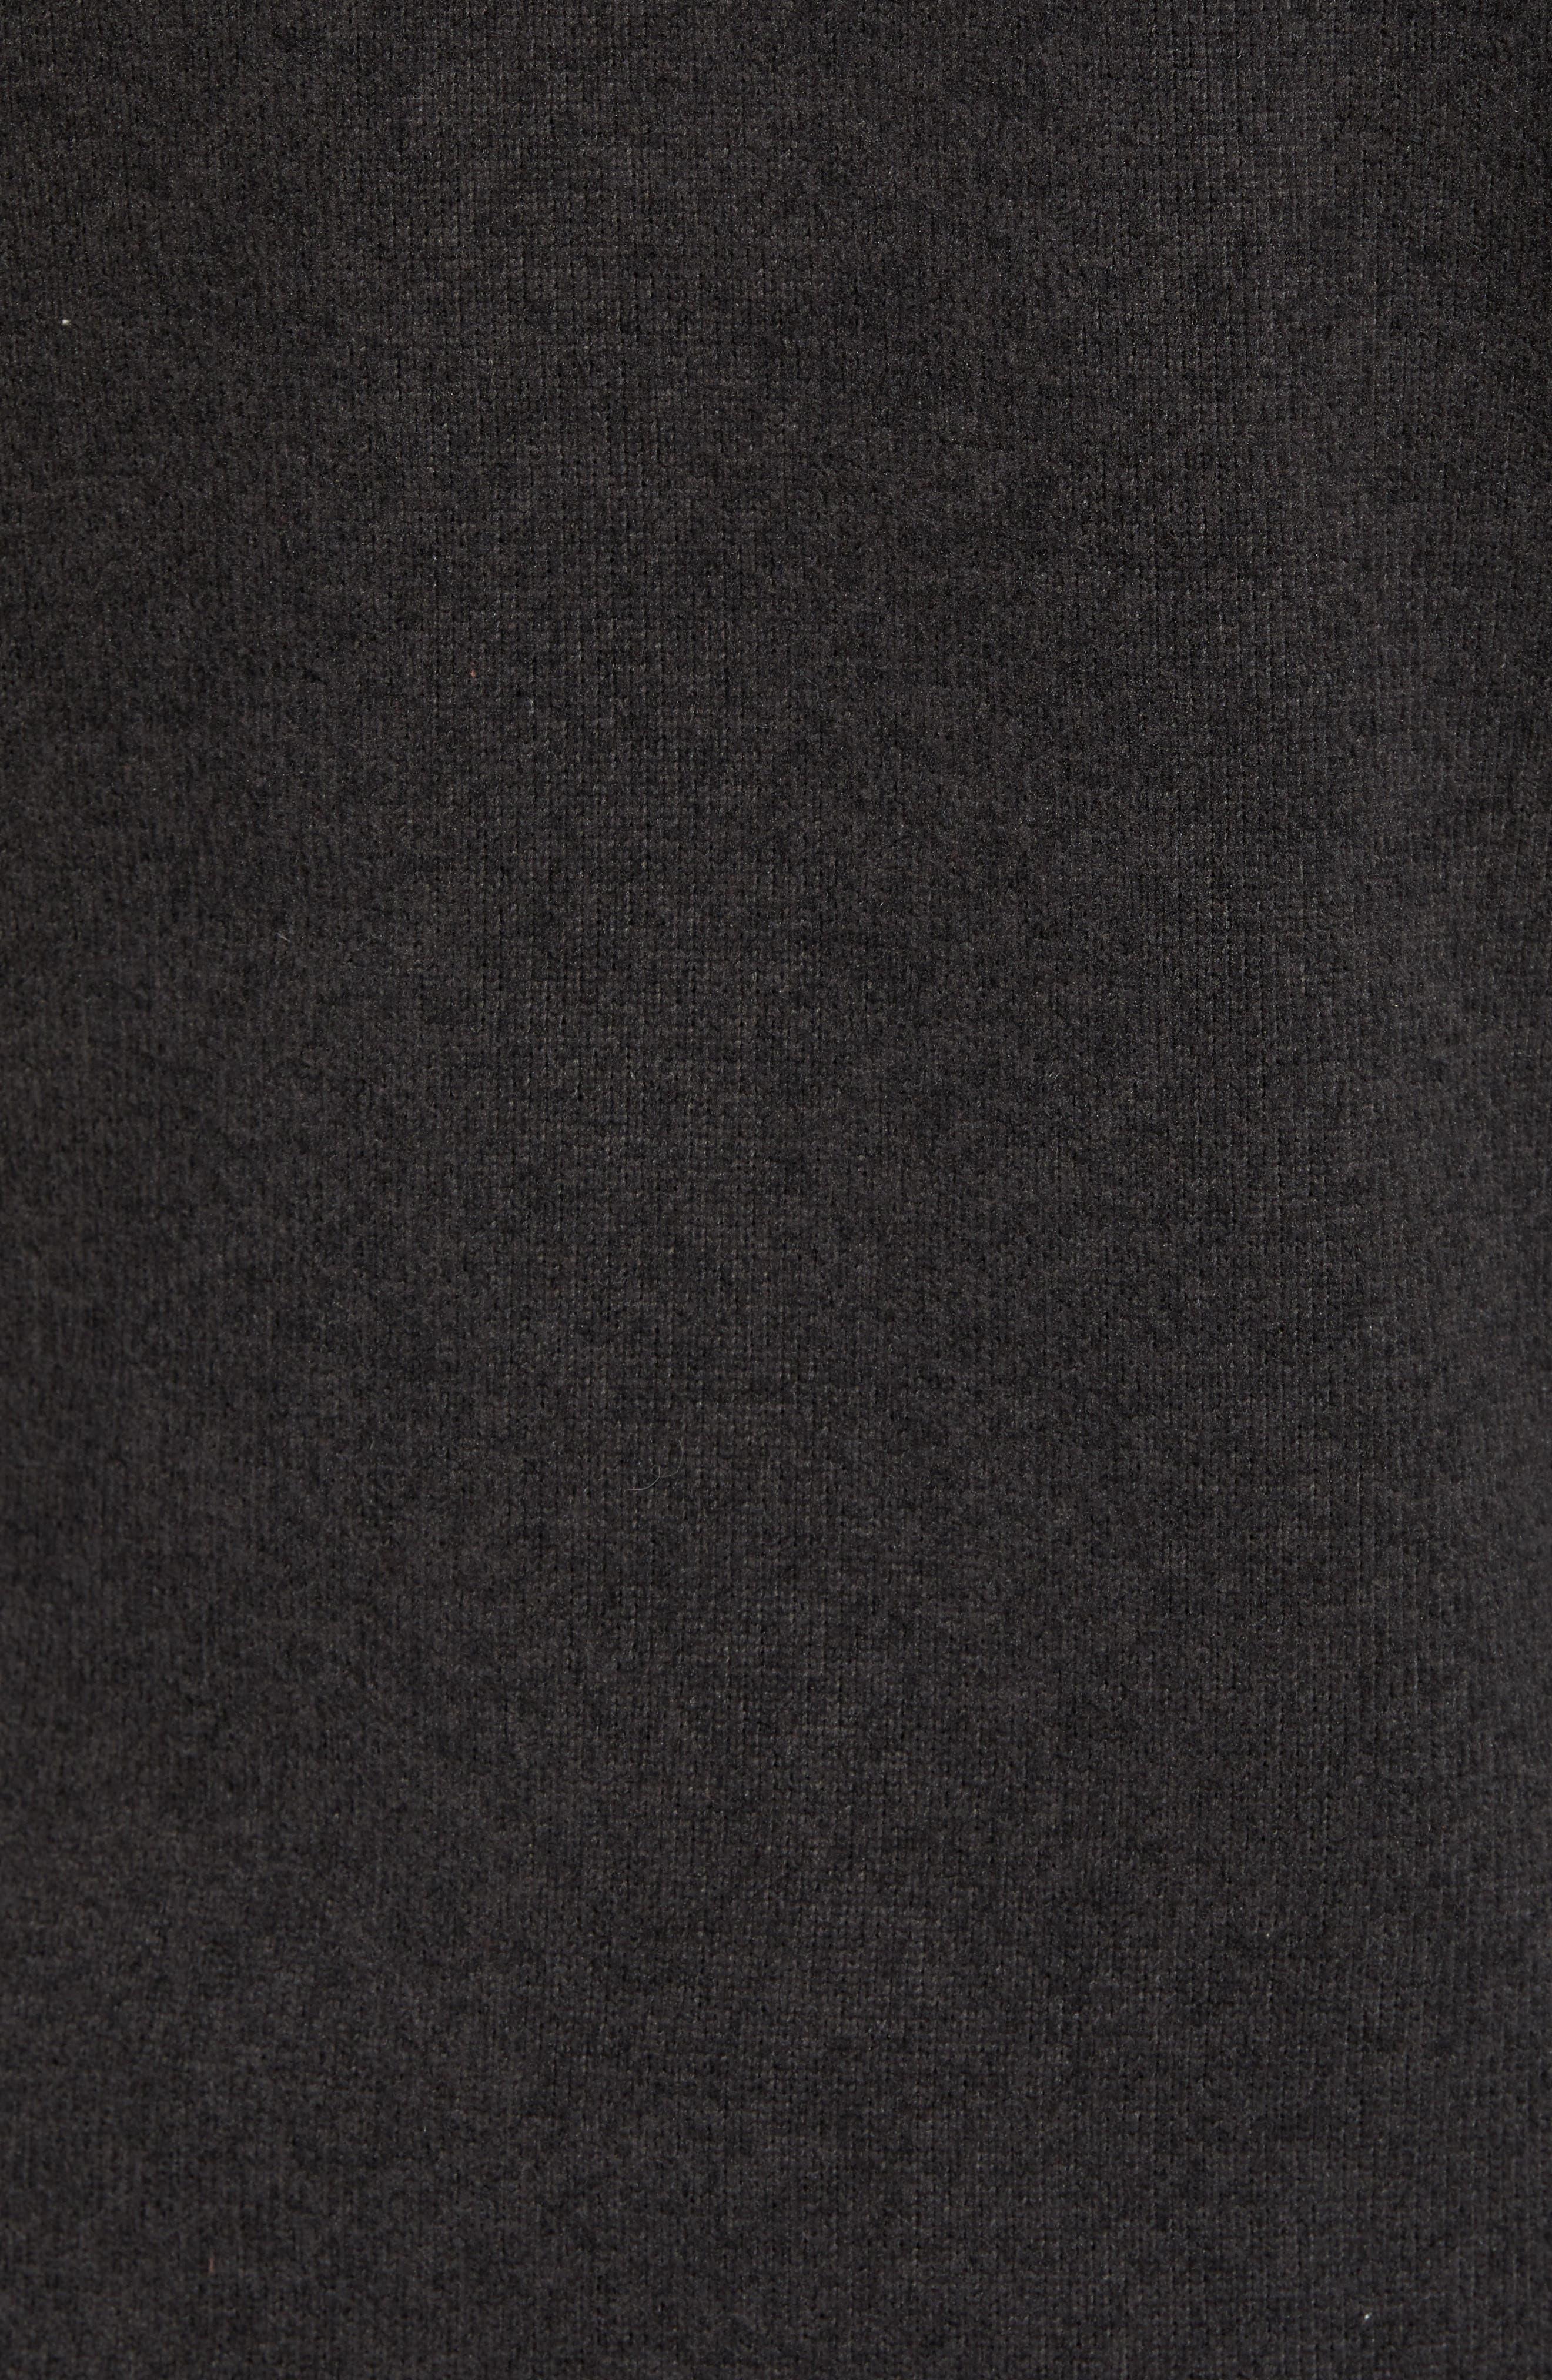 Gordon Lyons Relaxed Fit Sweater Fleece Hoodie,                             Alternate thumbnail 6, color,                             TNF BLACK HEATHER